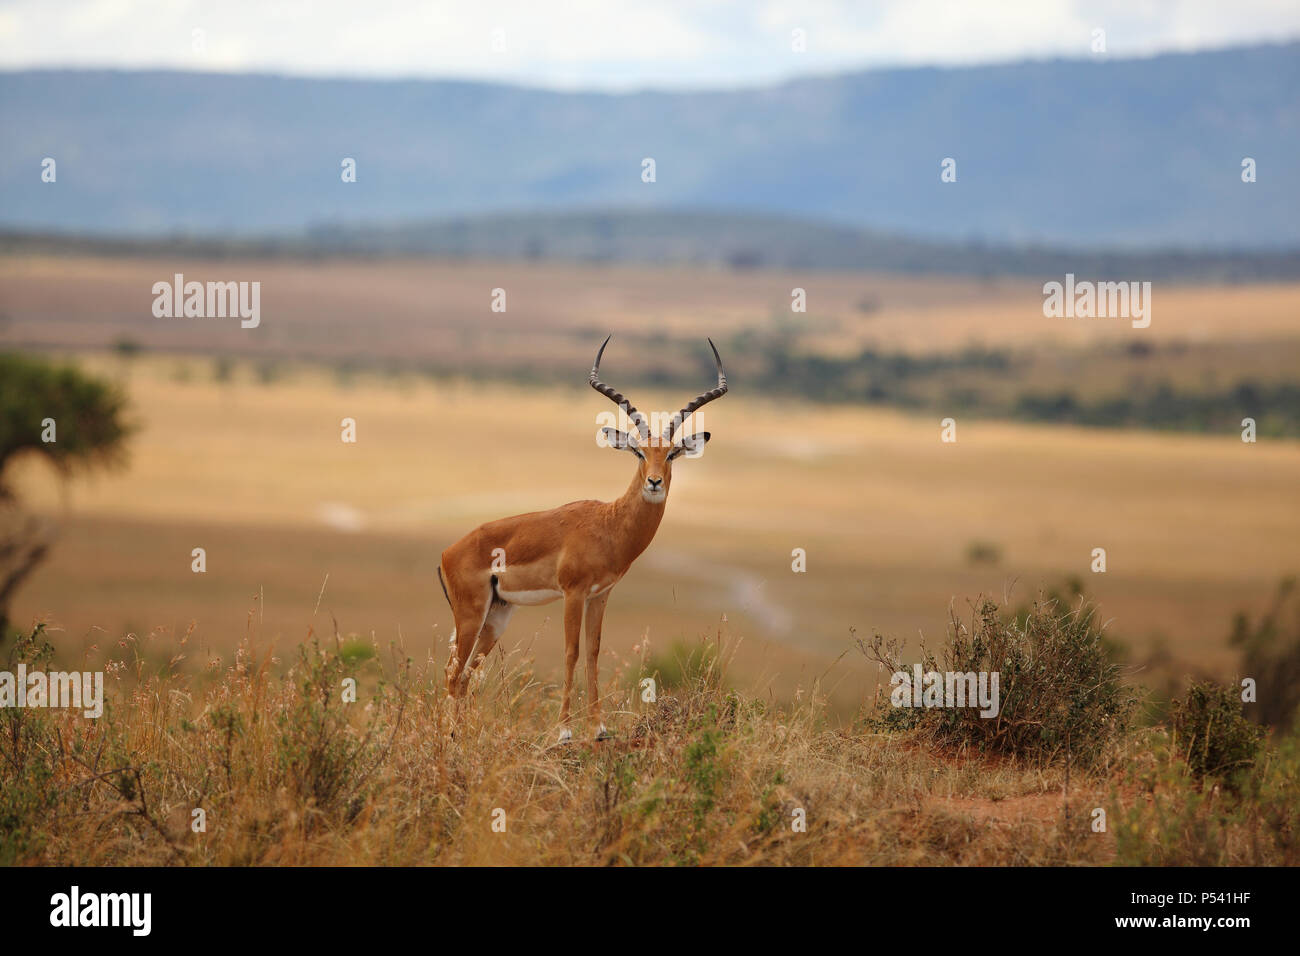 Male impala standing in savannah - Stock Image